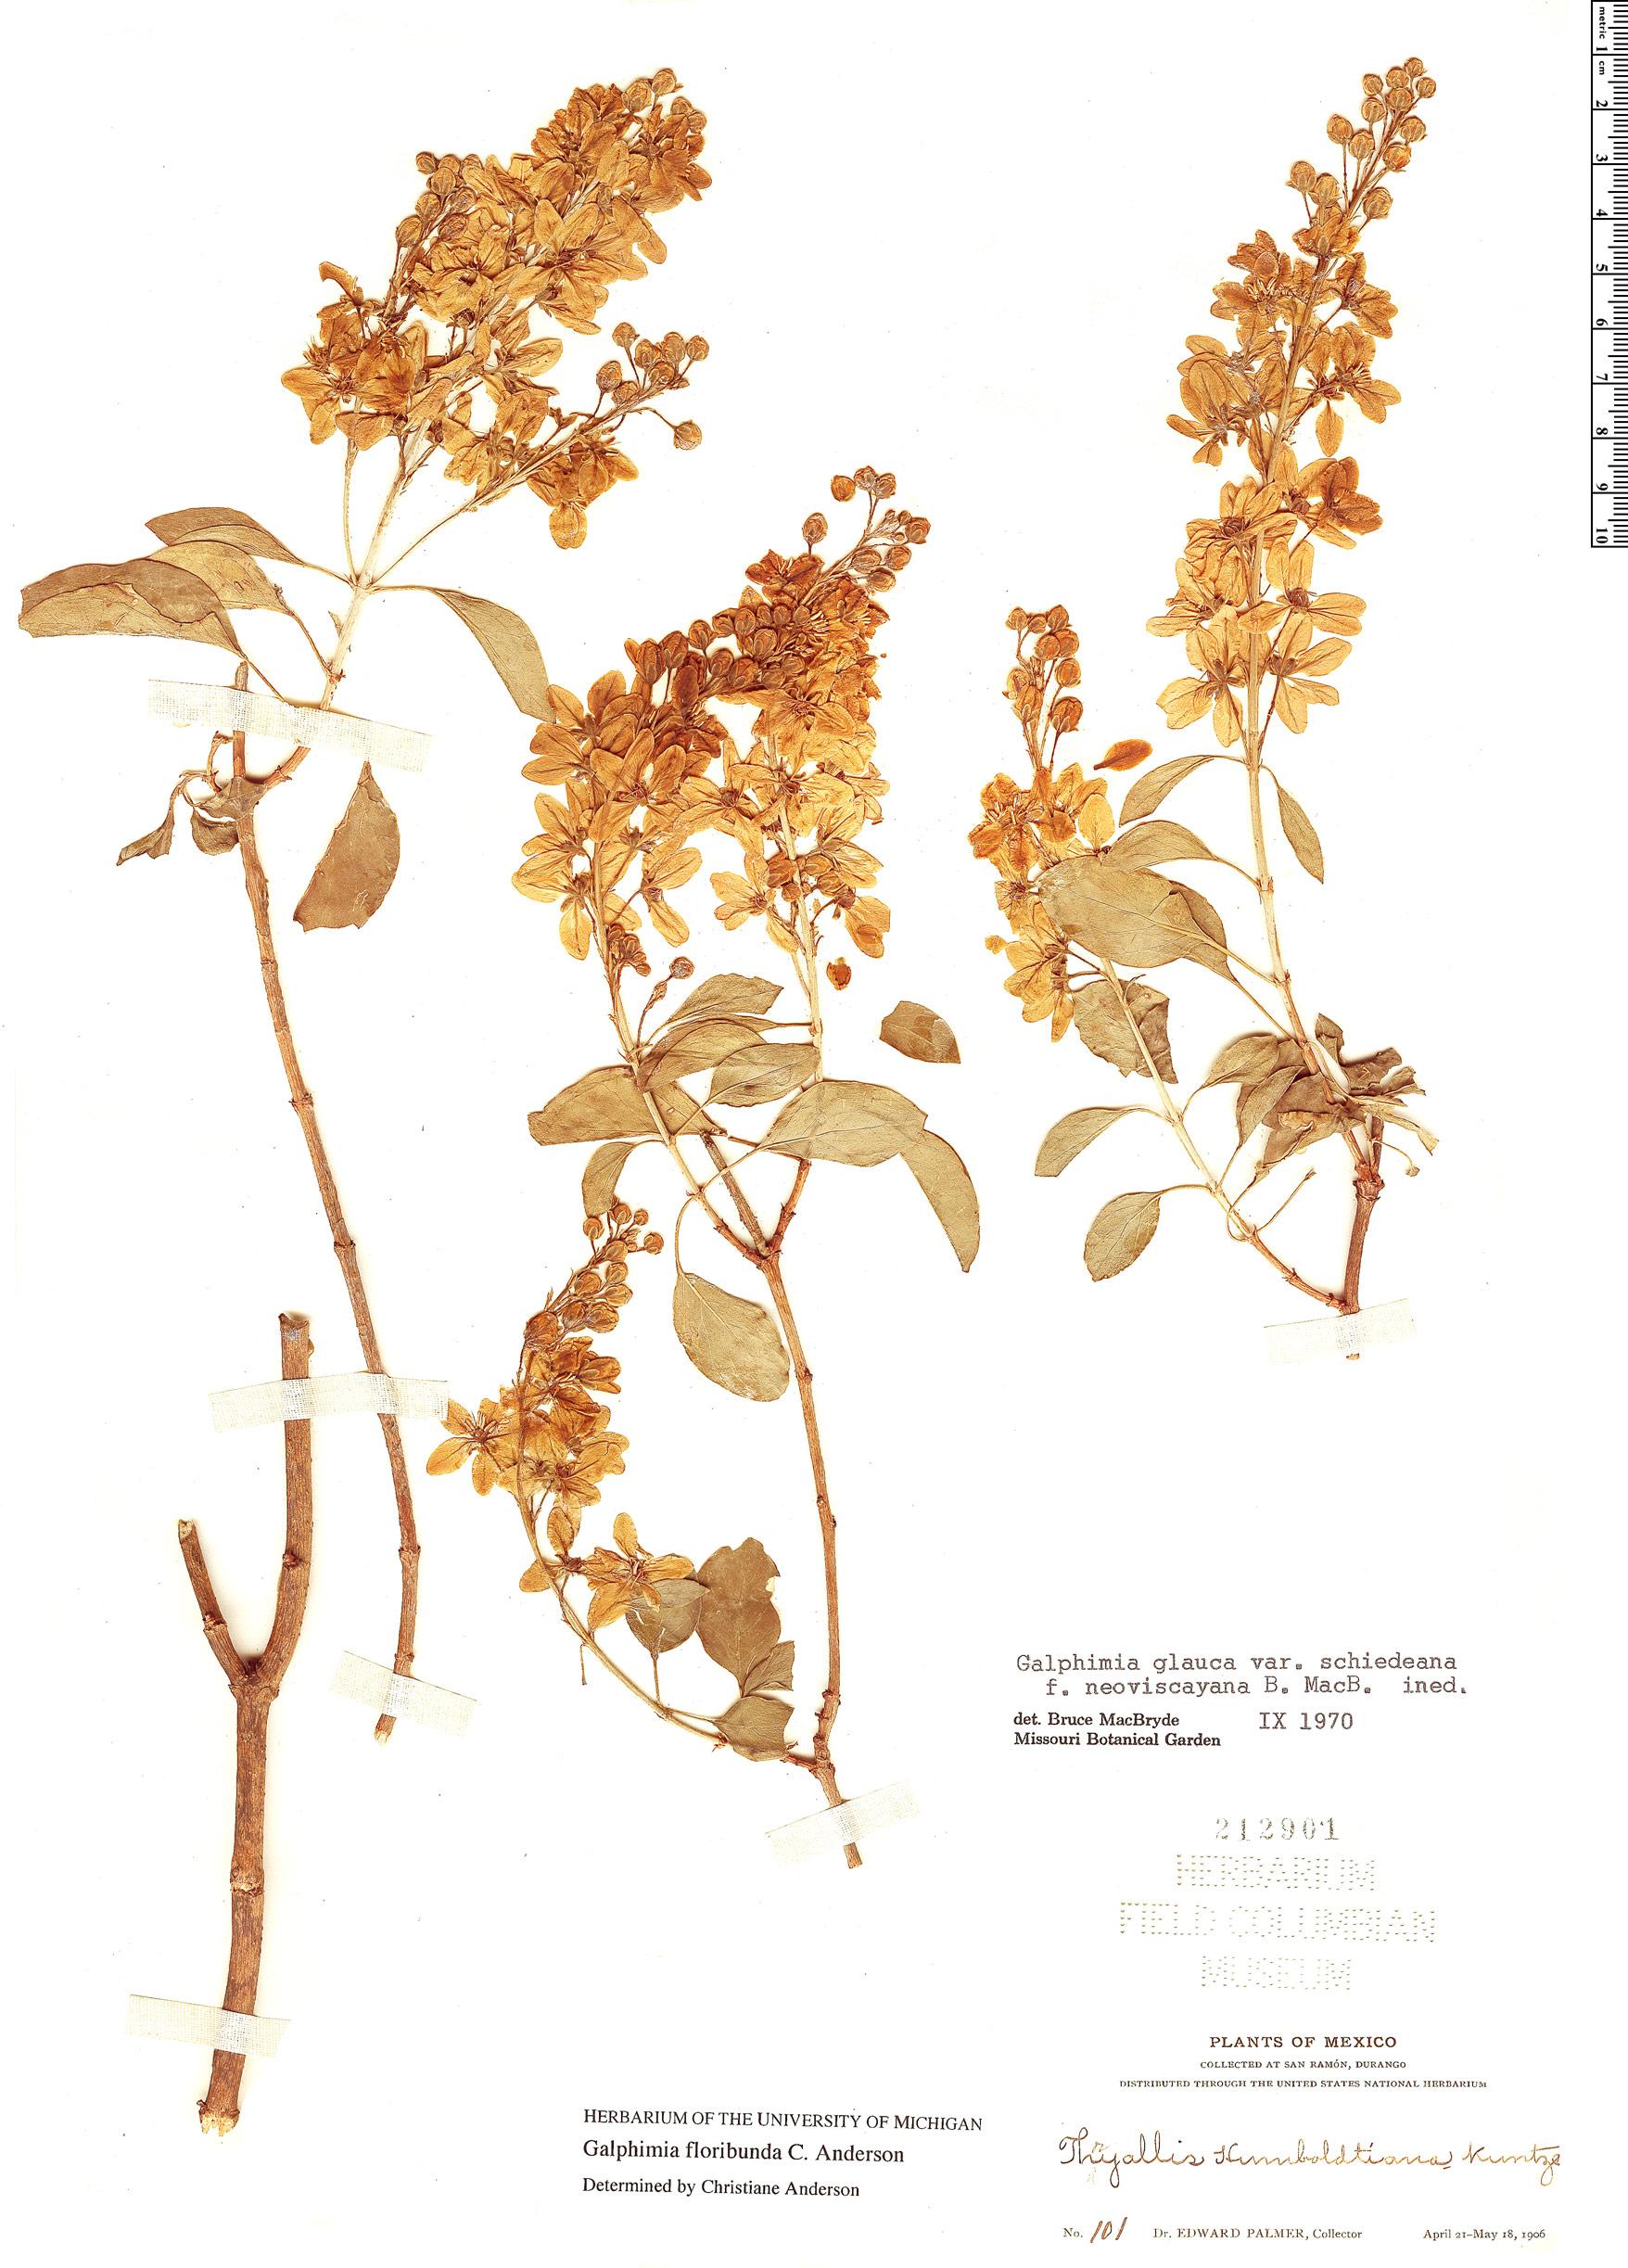 Specimen: Galphimia floribunda